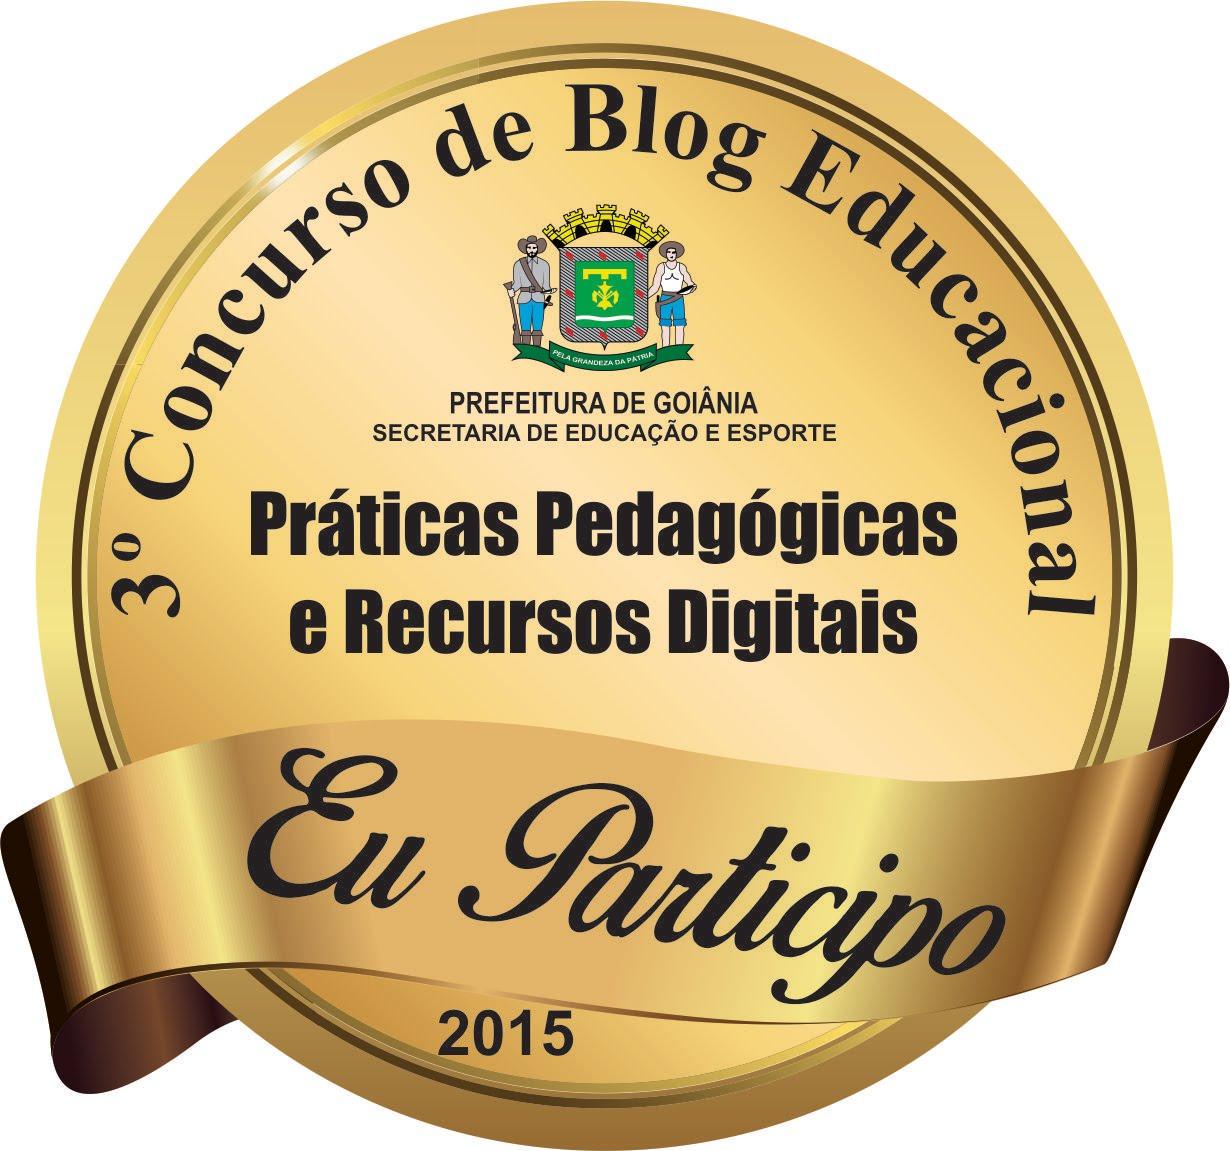 III Concurso de Blog Educacional da SME